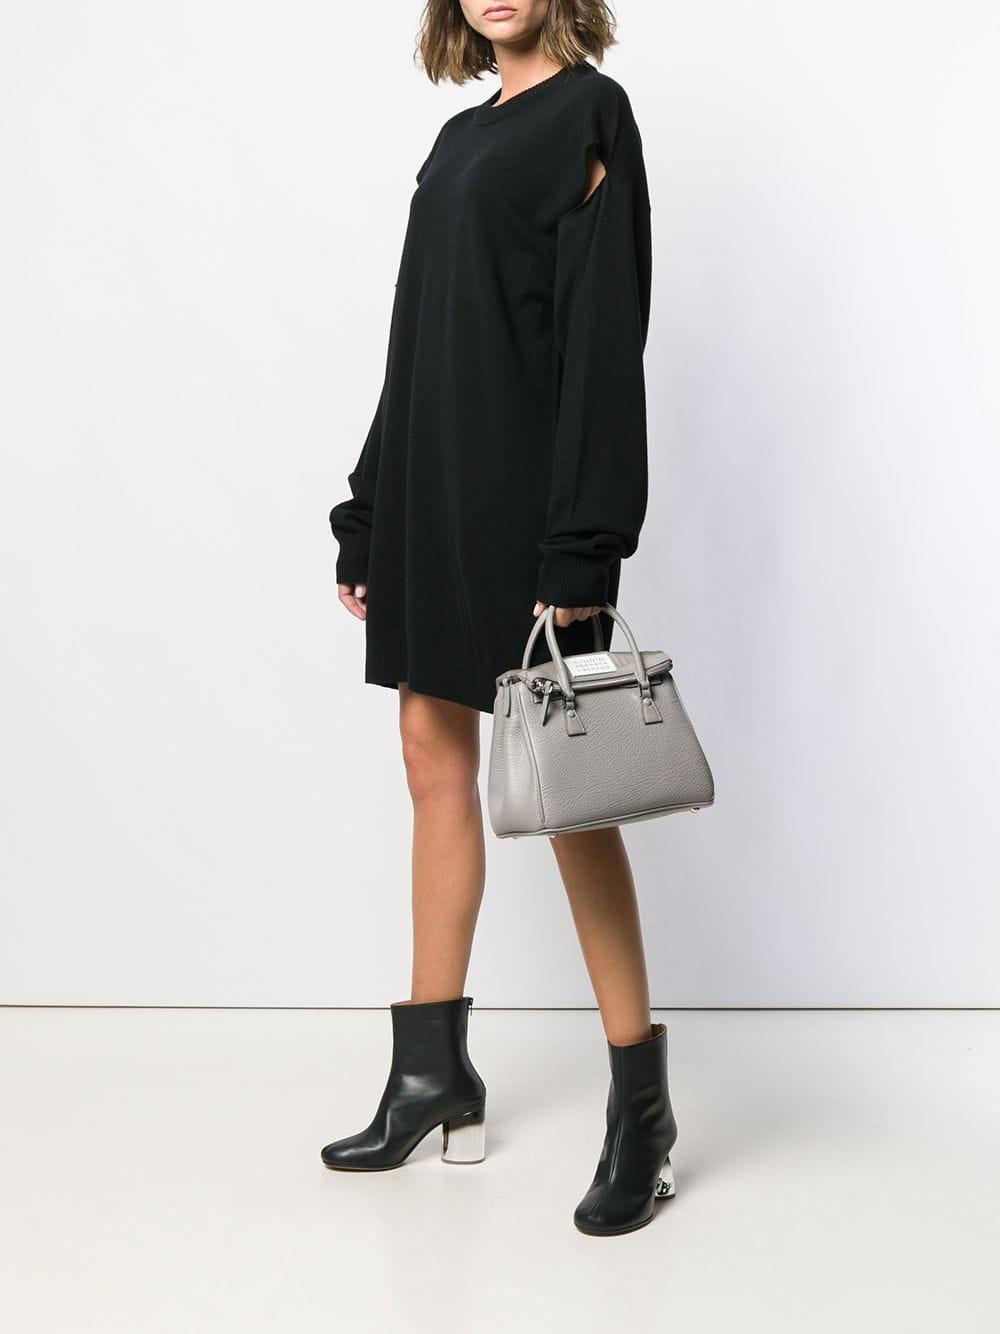 Vestido de punto con aberturas Maison Margiela de Lana de color Negro